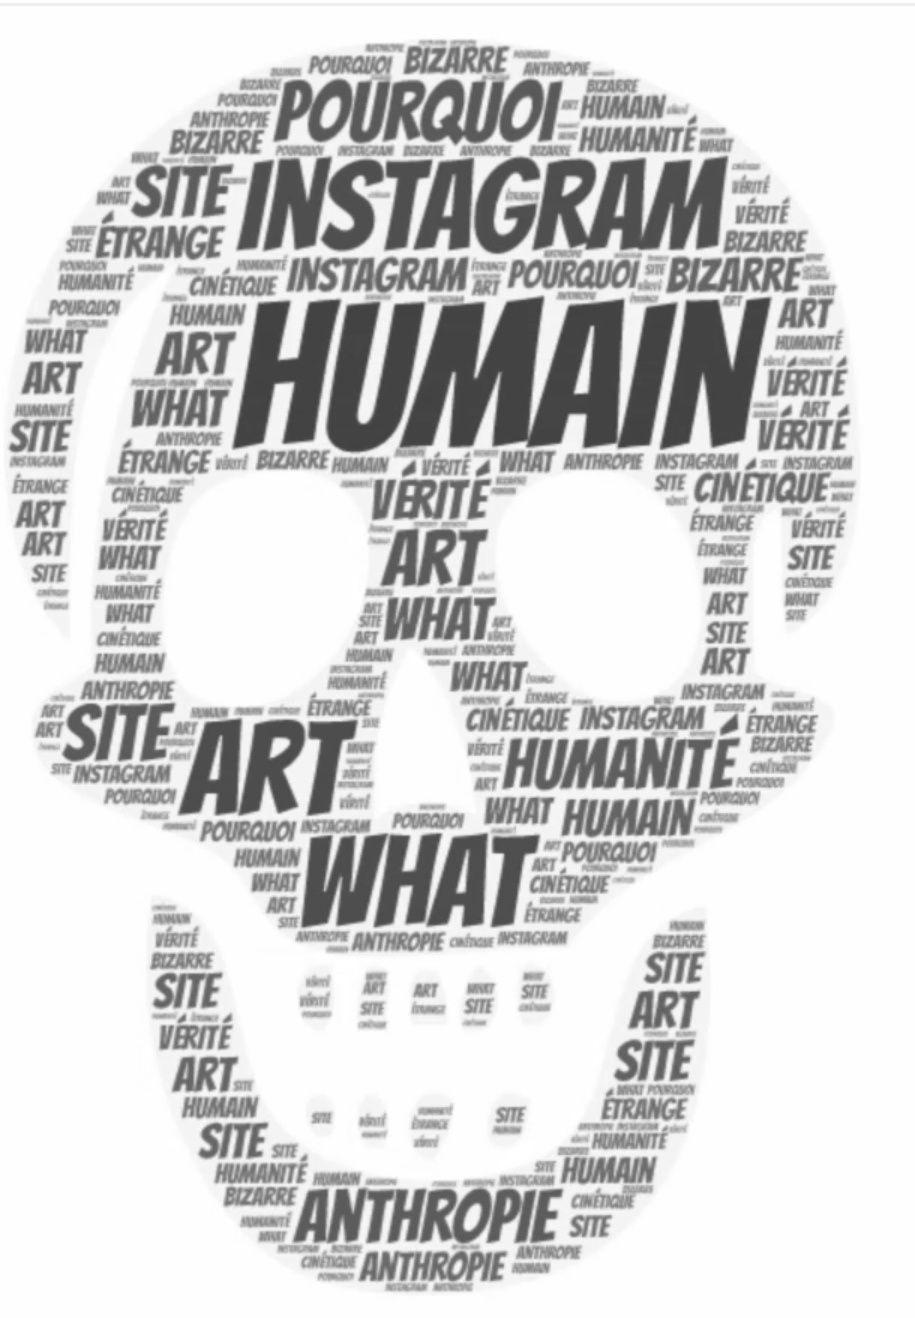 Nuage de mots - Anthropie